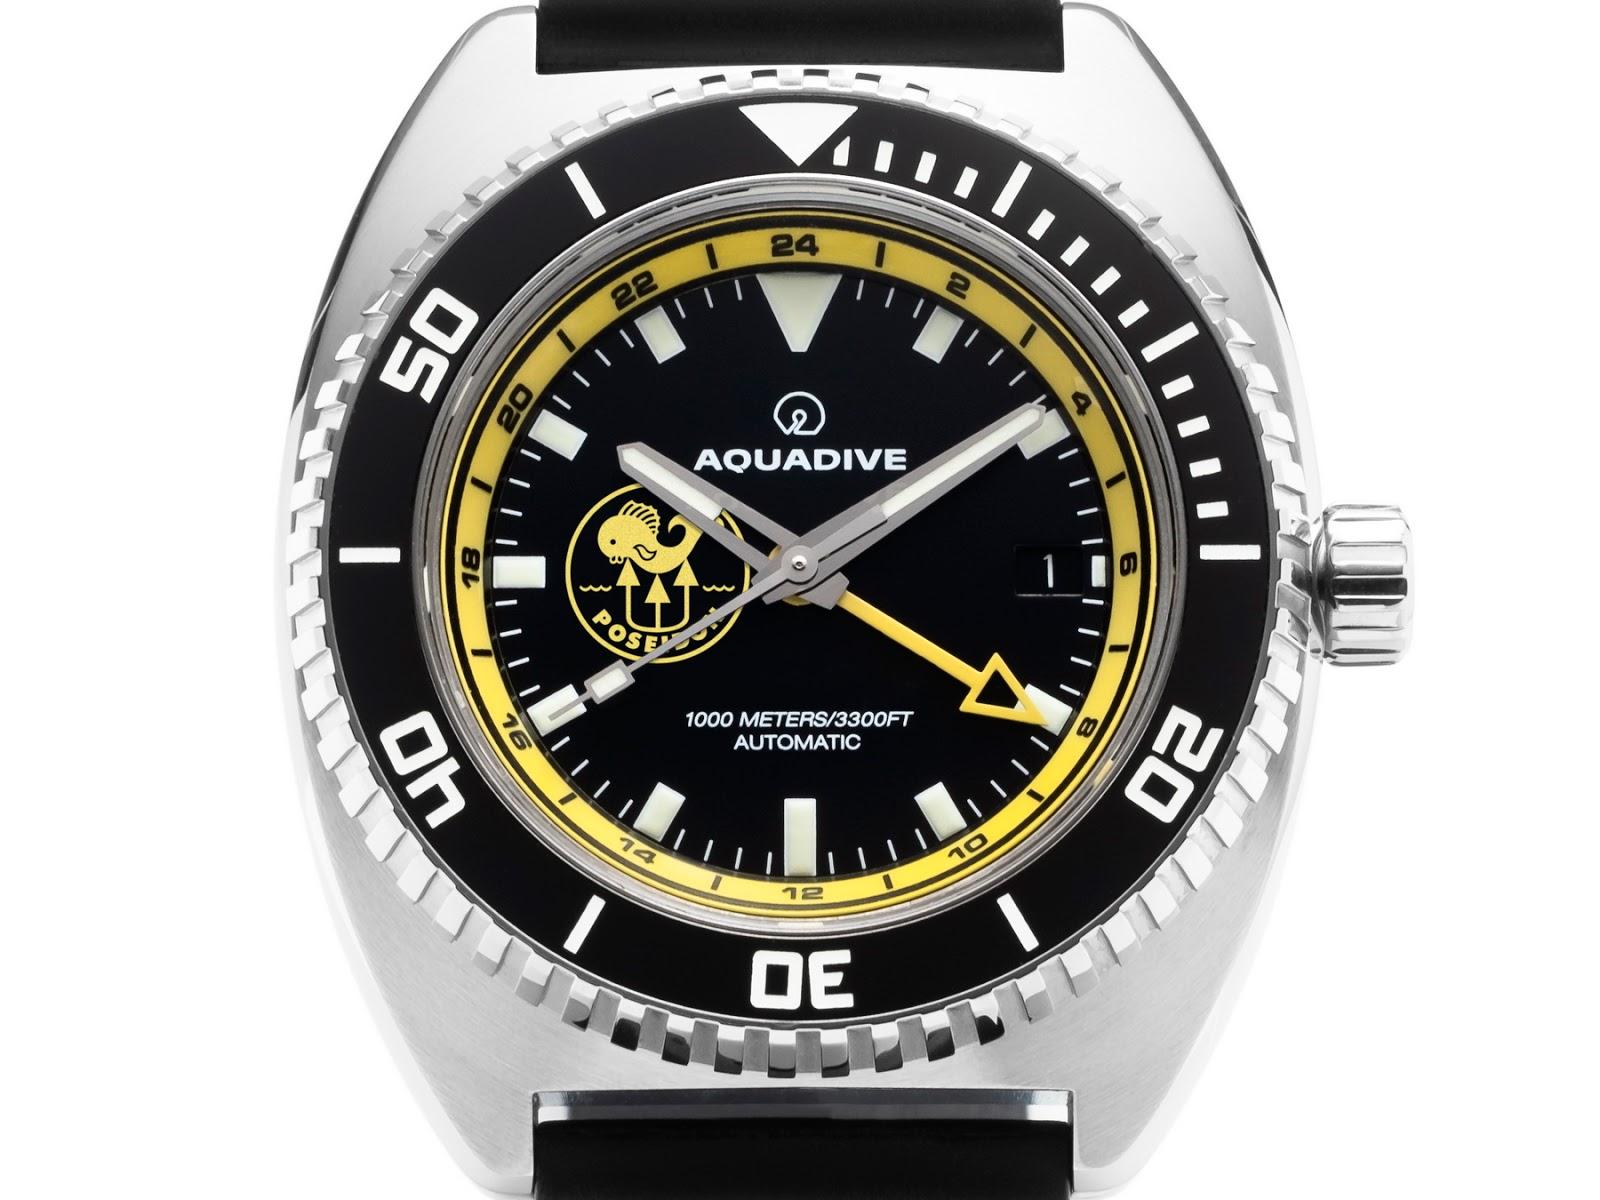 Aquadive's new Poseidon GMT AQUADIVE+Bathyscaphe+100+GMT+POSEIDON+01